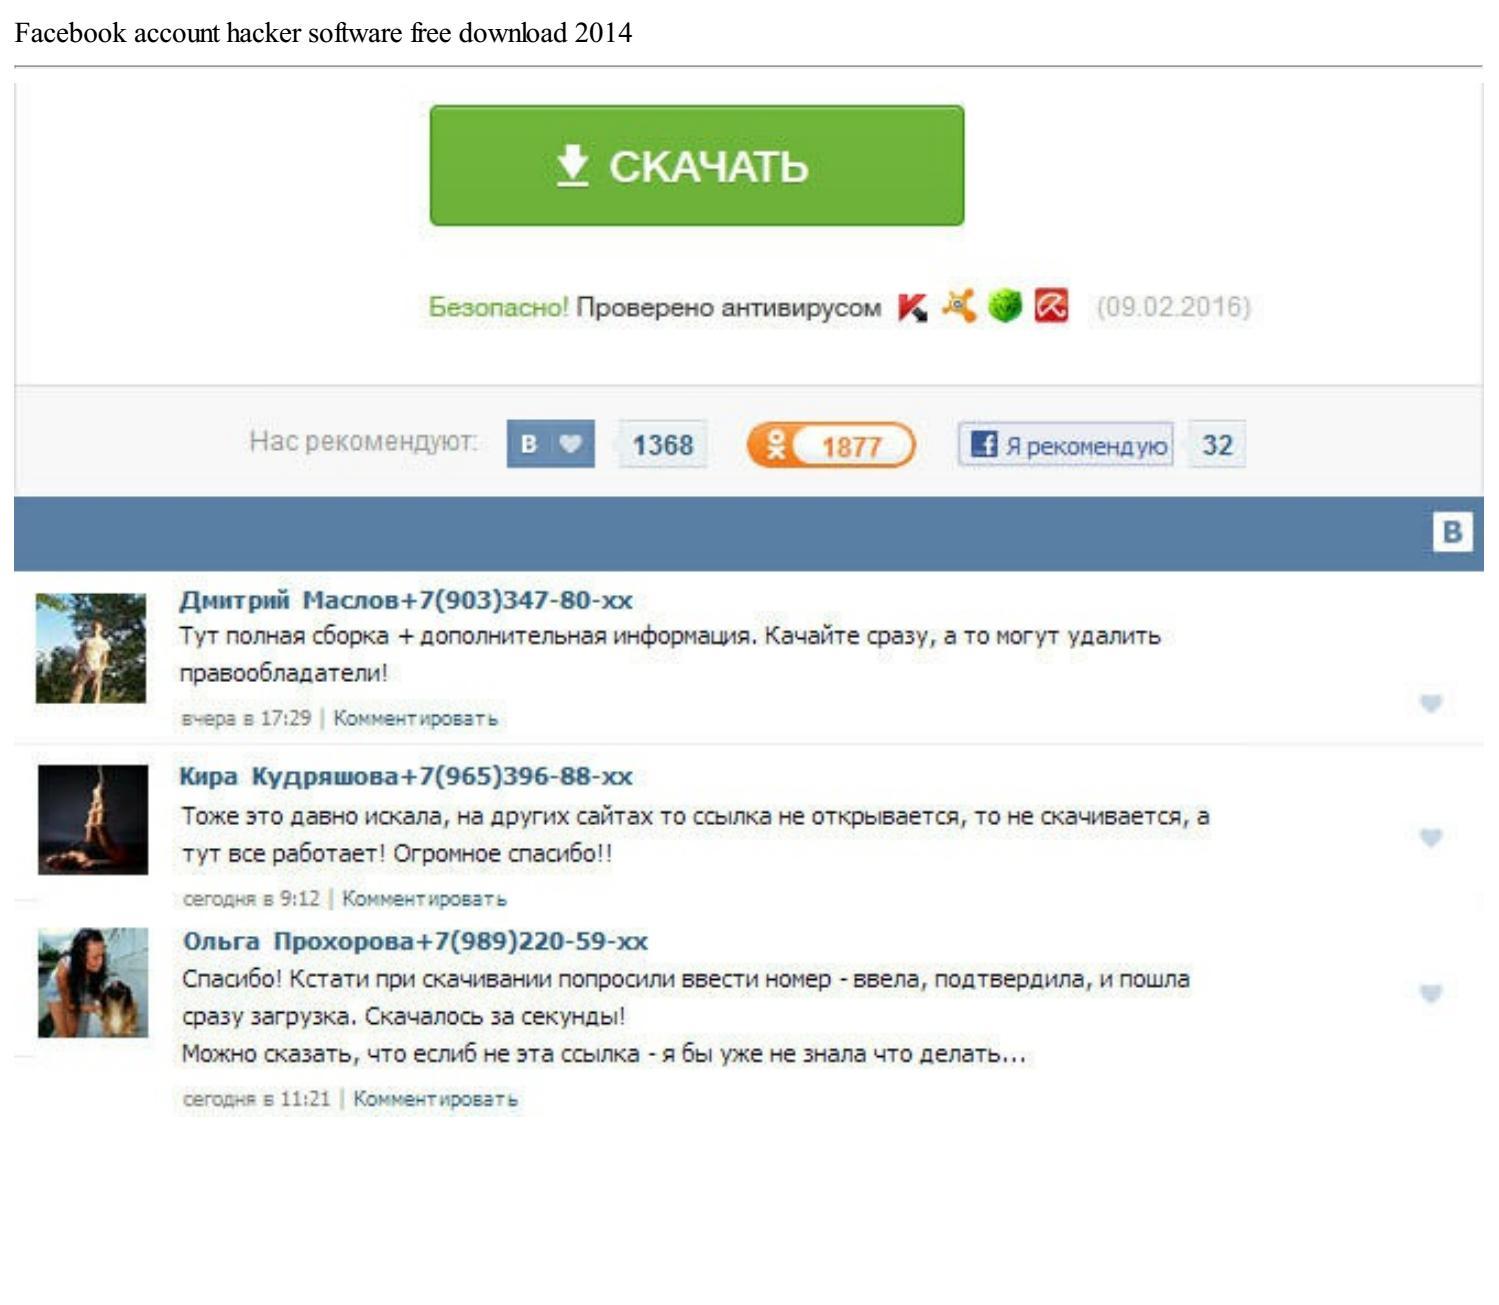 facebook account hacker software download